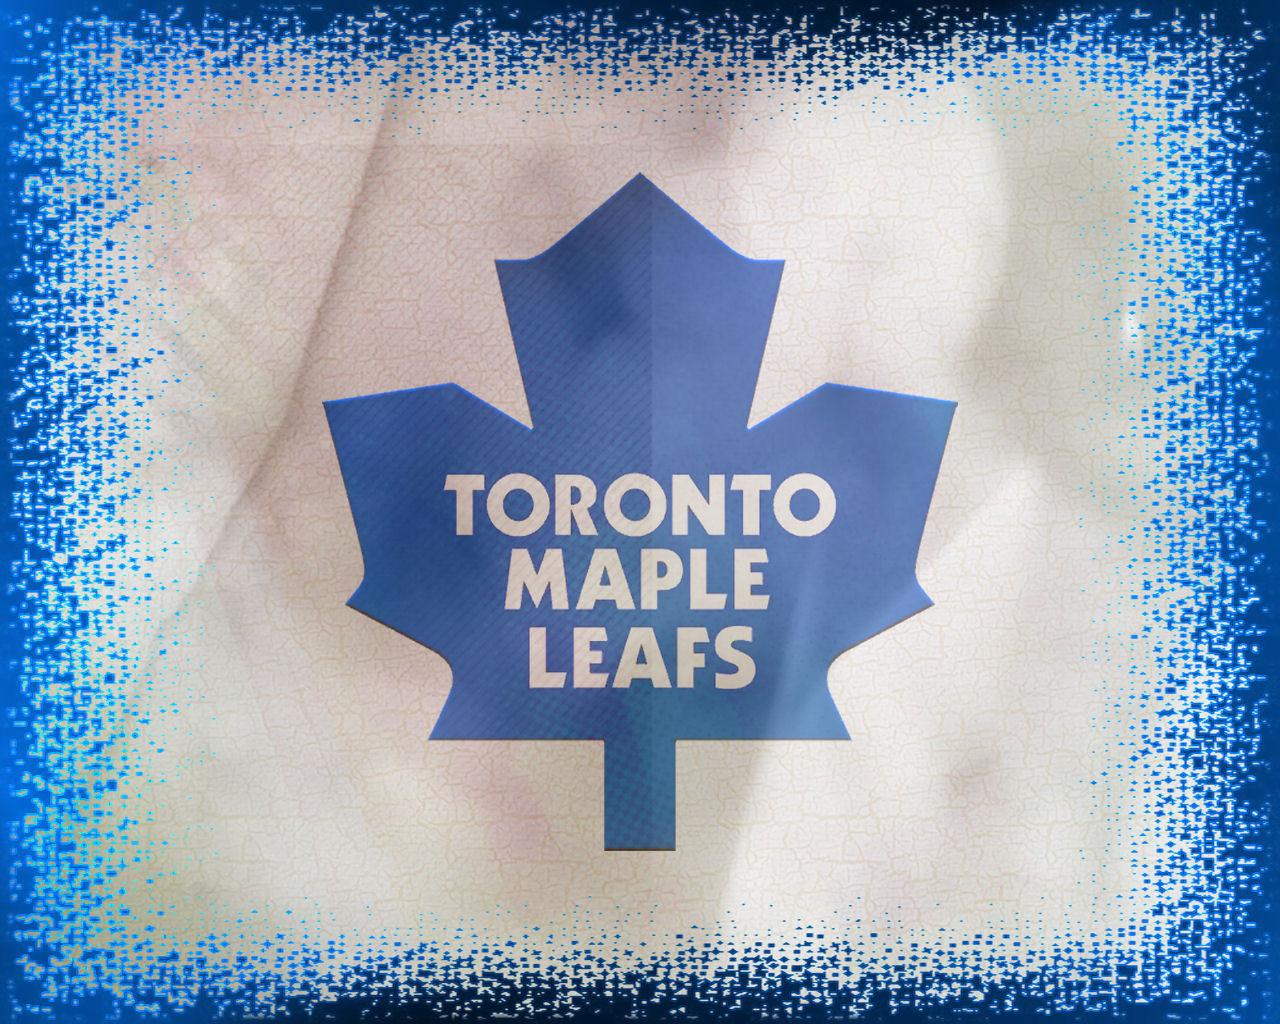 NHL Wallpapers   Toronto Maple Leafs wallpaper 1280x1024